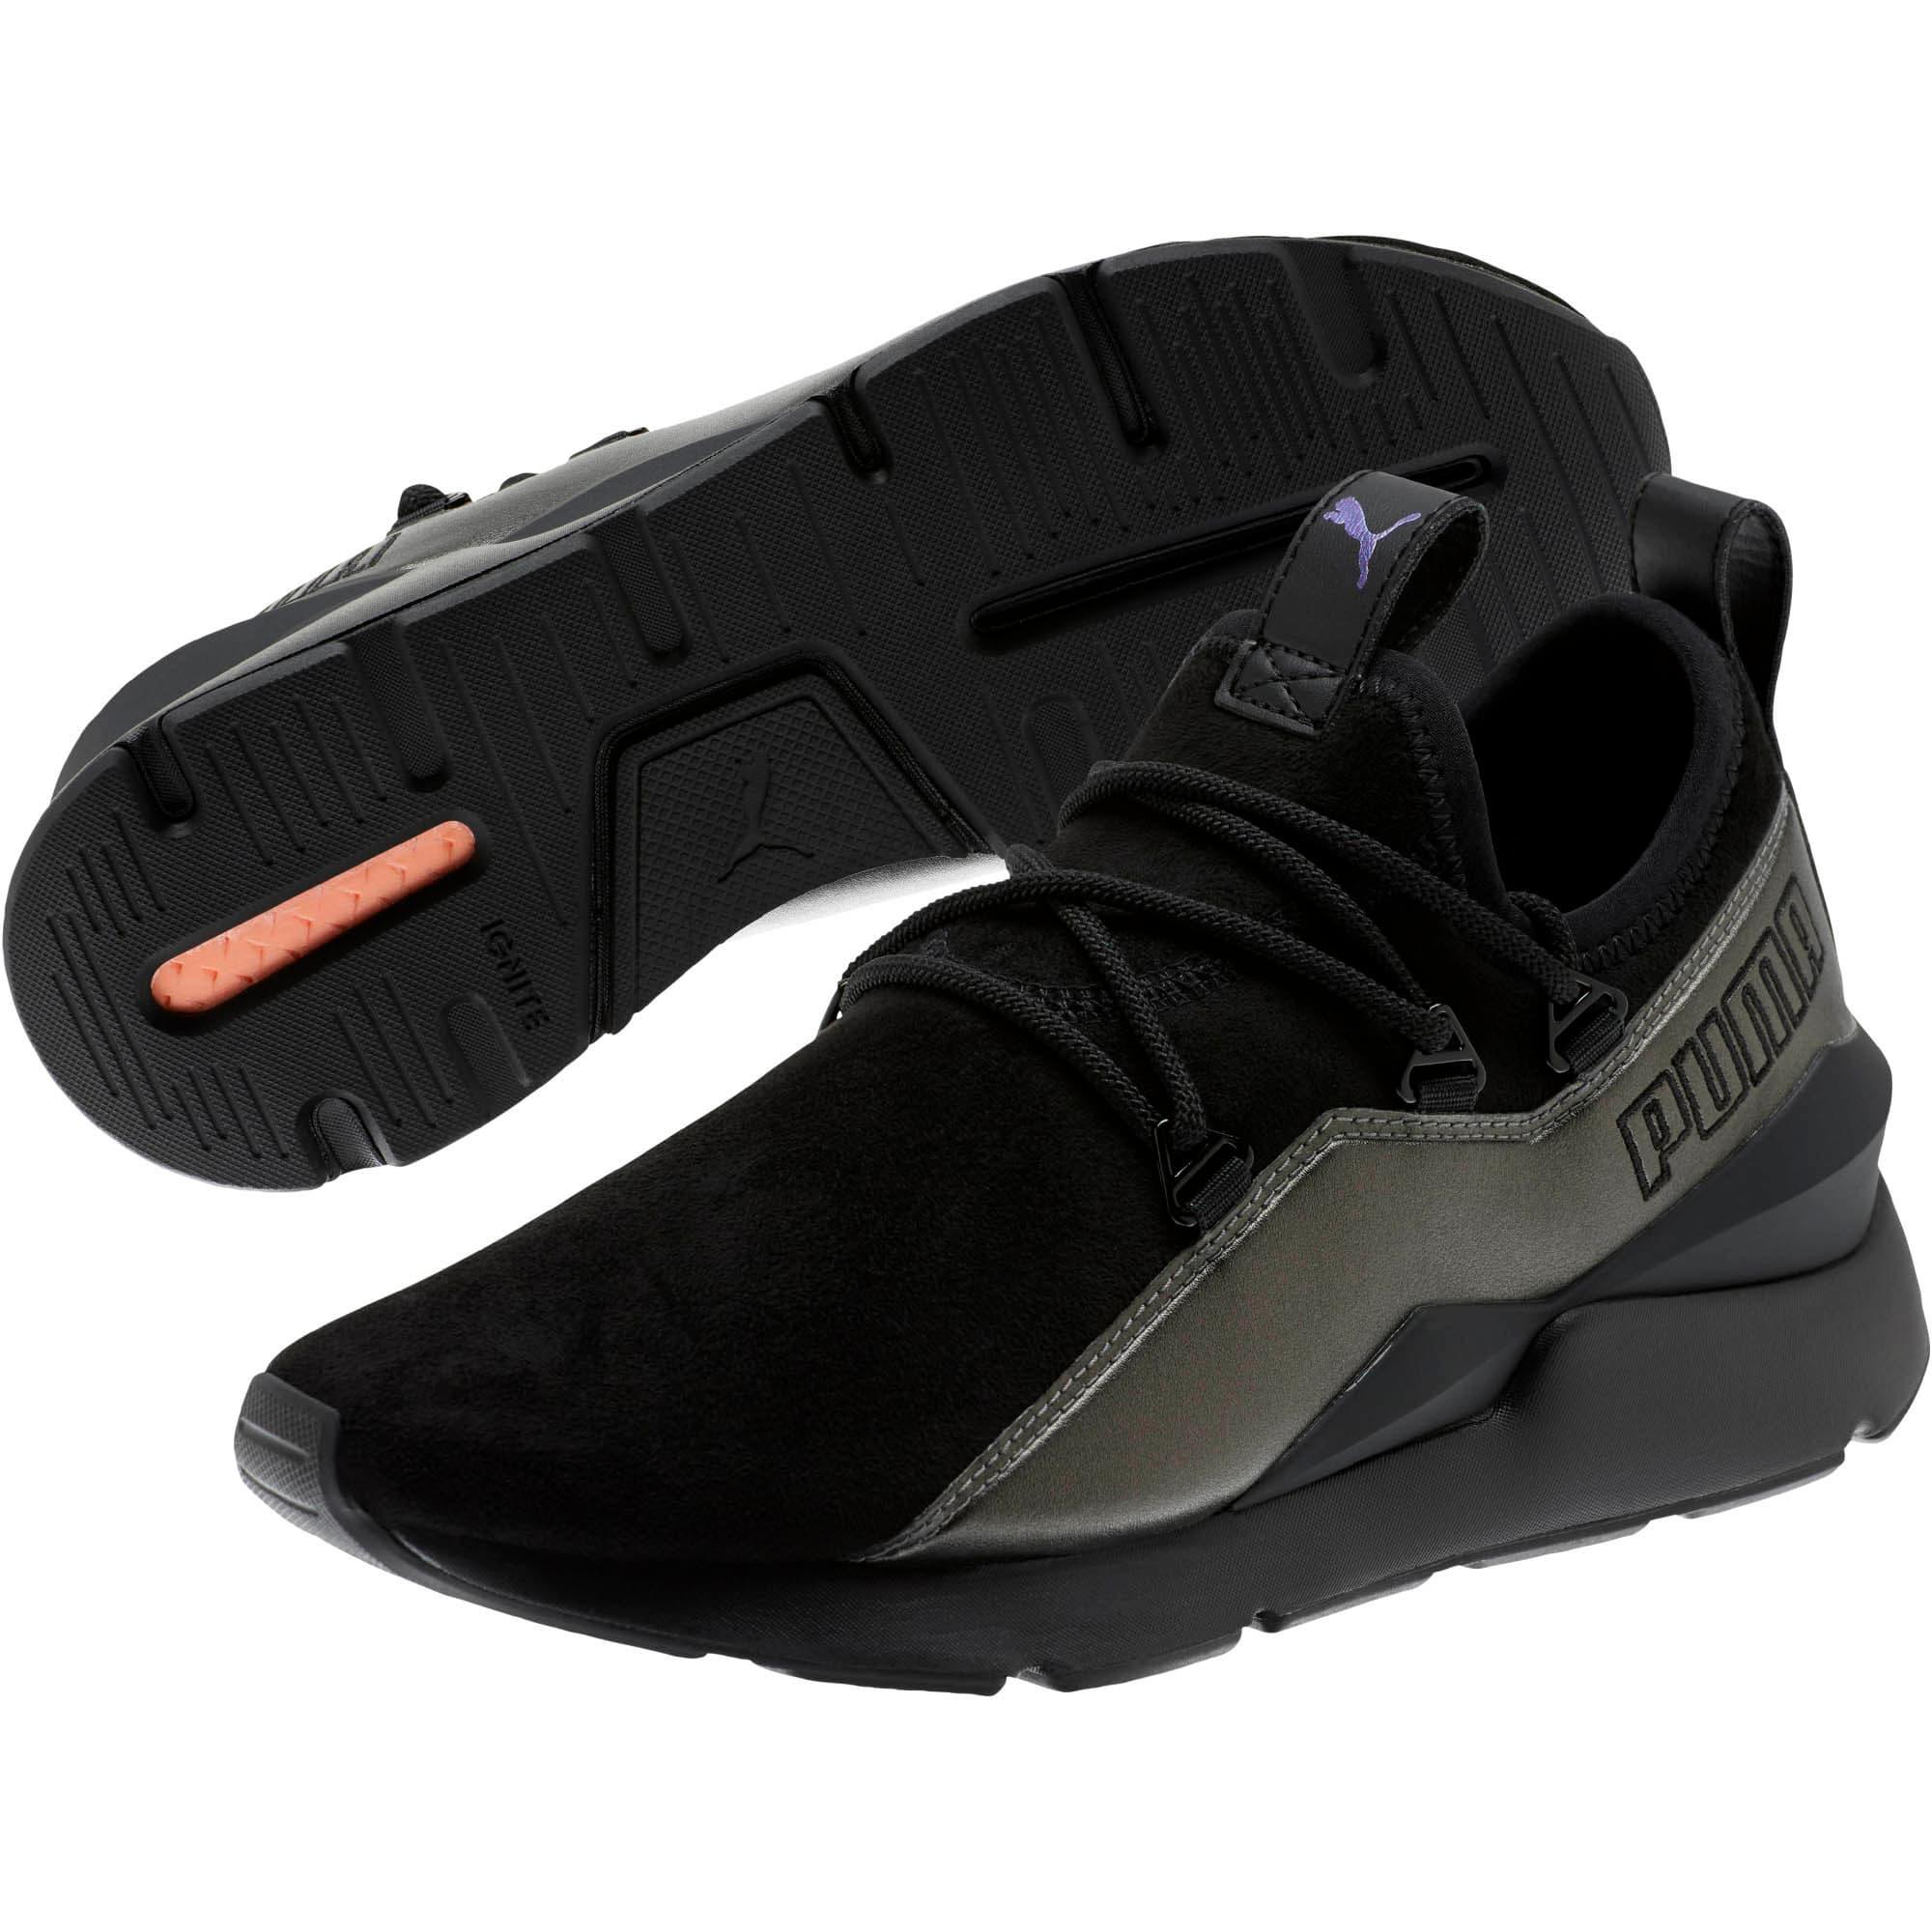 Miniatura 2 de Zapatos deportivosMuse 2 Twilight de mujer, Puma Black-Puma Black, mediano